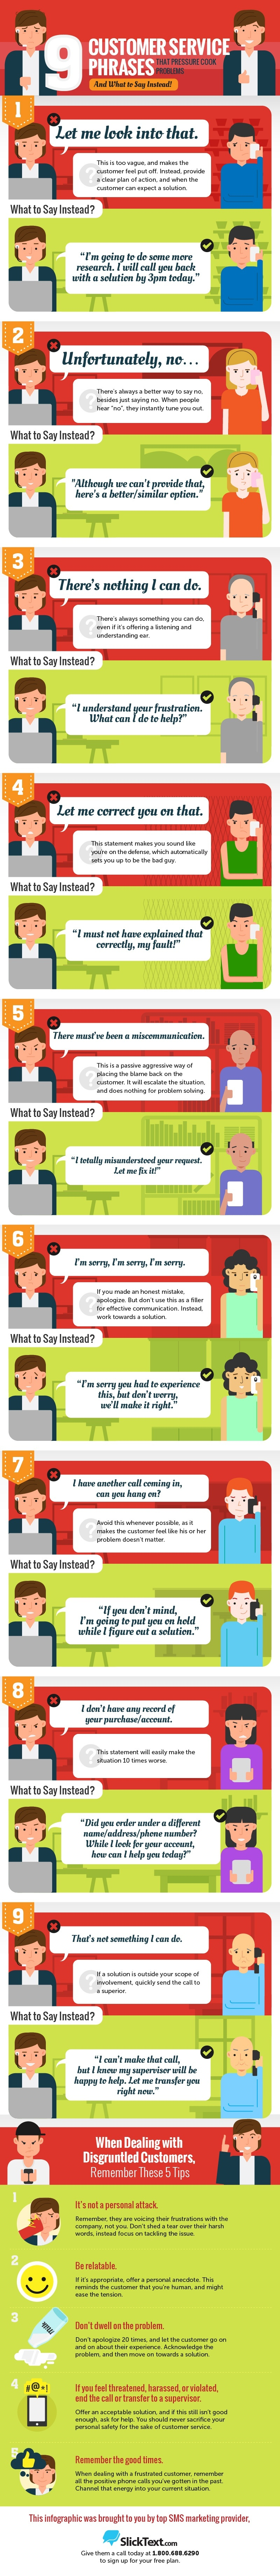 customer_service_phrases_to_avoid-1.jpg